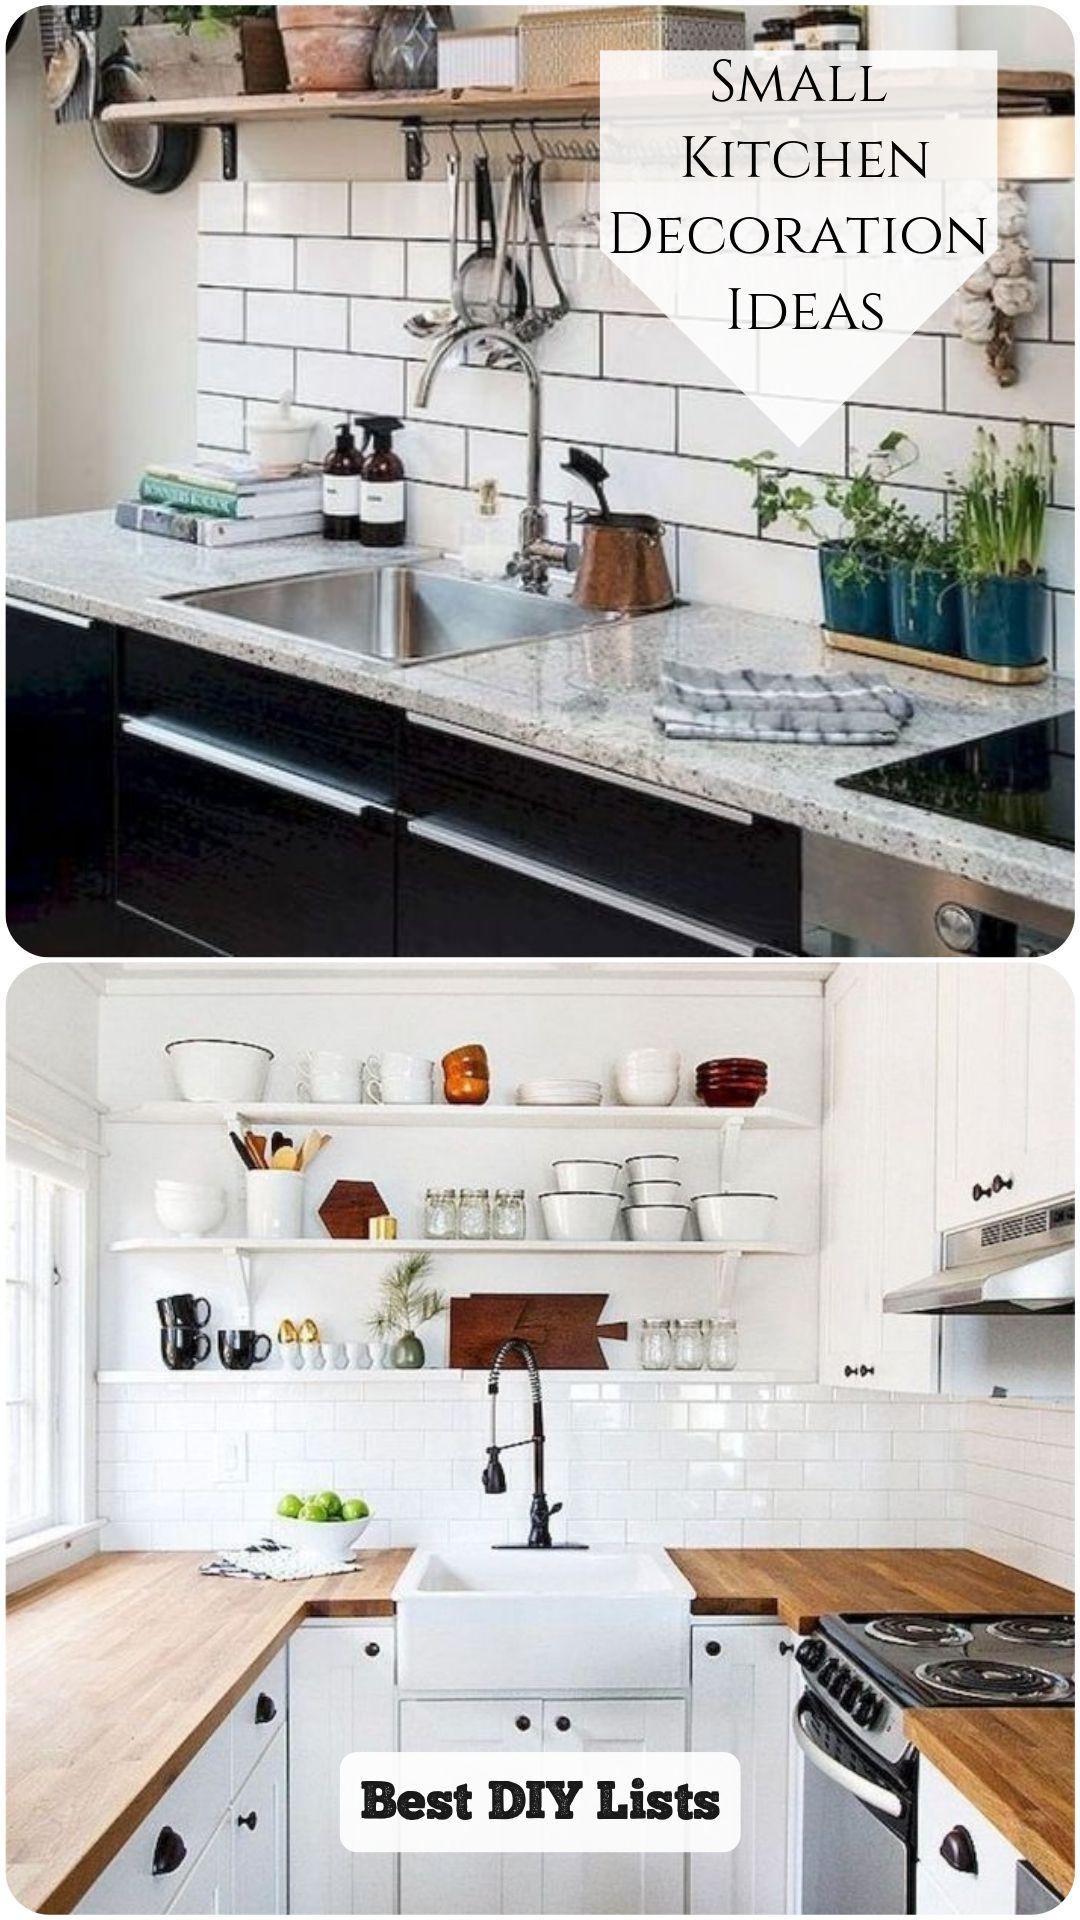 Small Kitchen Decoration Ideas Kitchen Remodel Small Kitchen Decor Diy Kitchen Decor